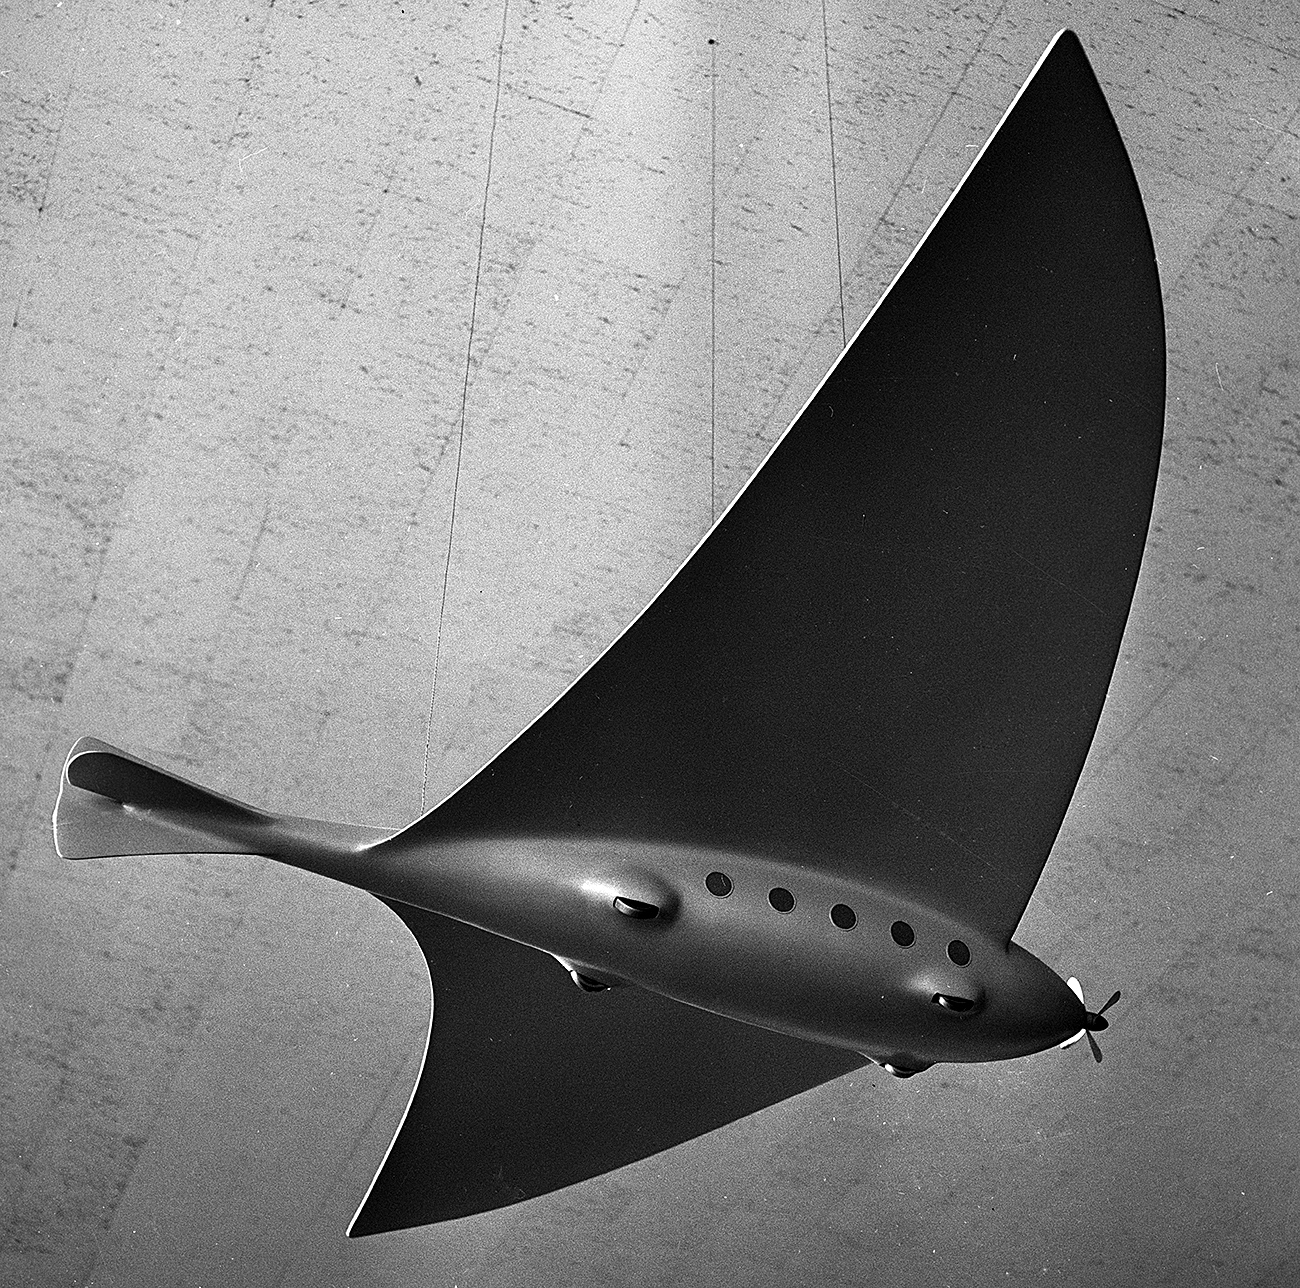 An aircraft model based on the drawings of Konstantin Tsiolkovsky, 1895. Tsiolkovsky State Museum of the History of Cosmonautics. Source: Igor Vinogradov/RIA Novosti